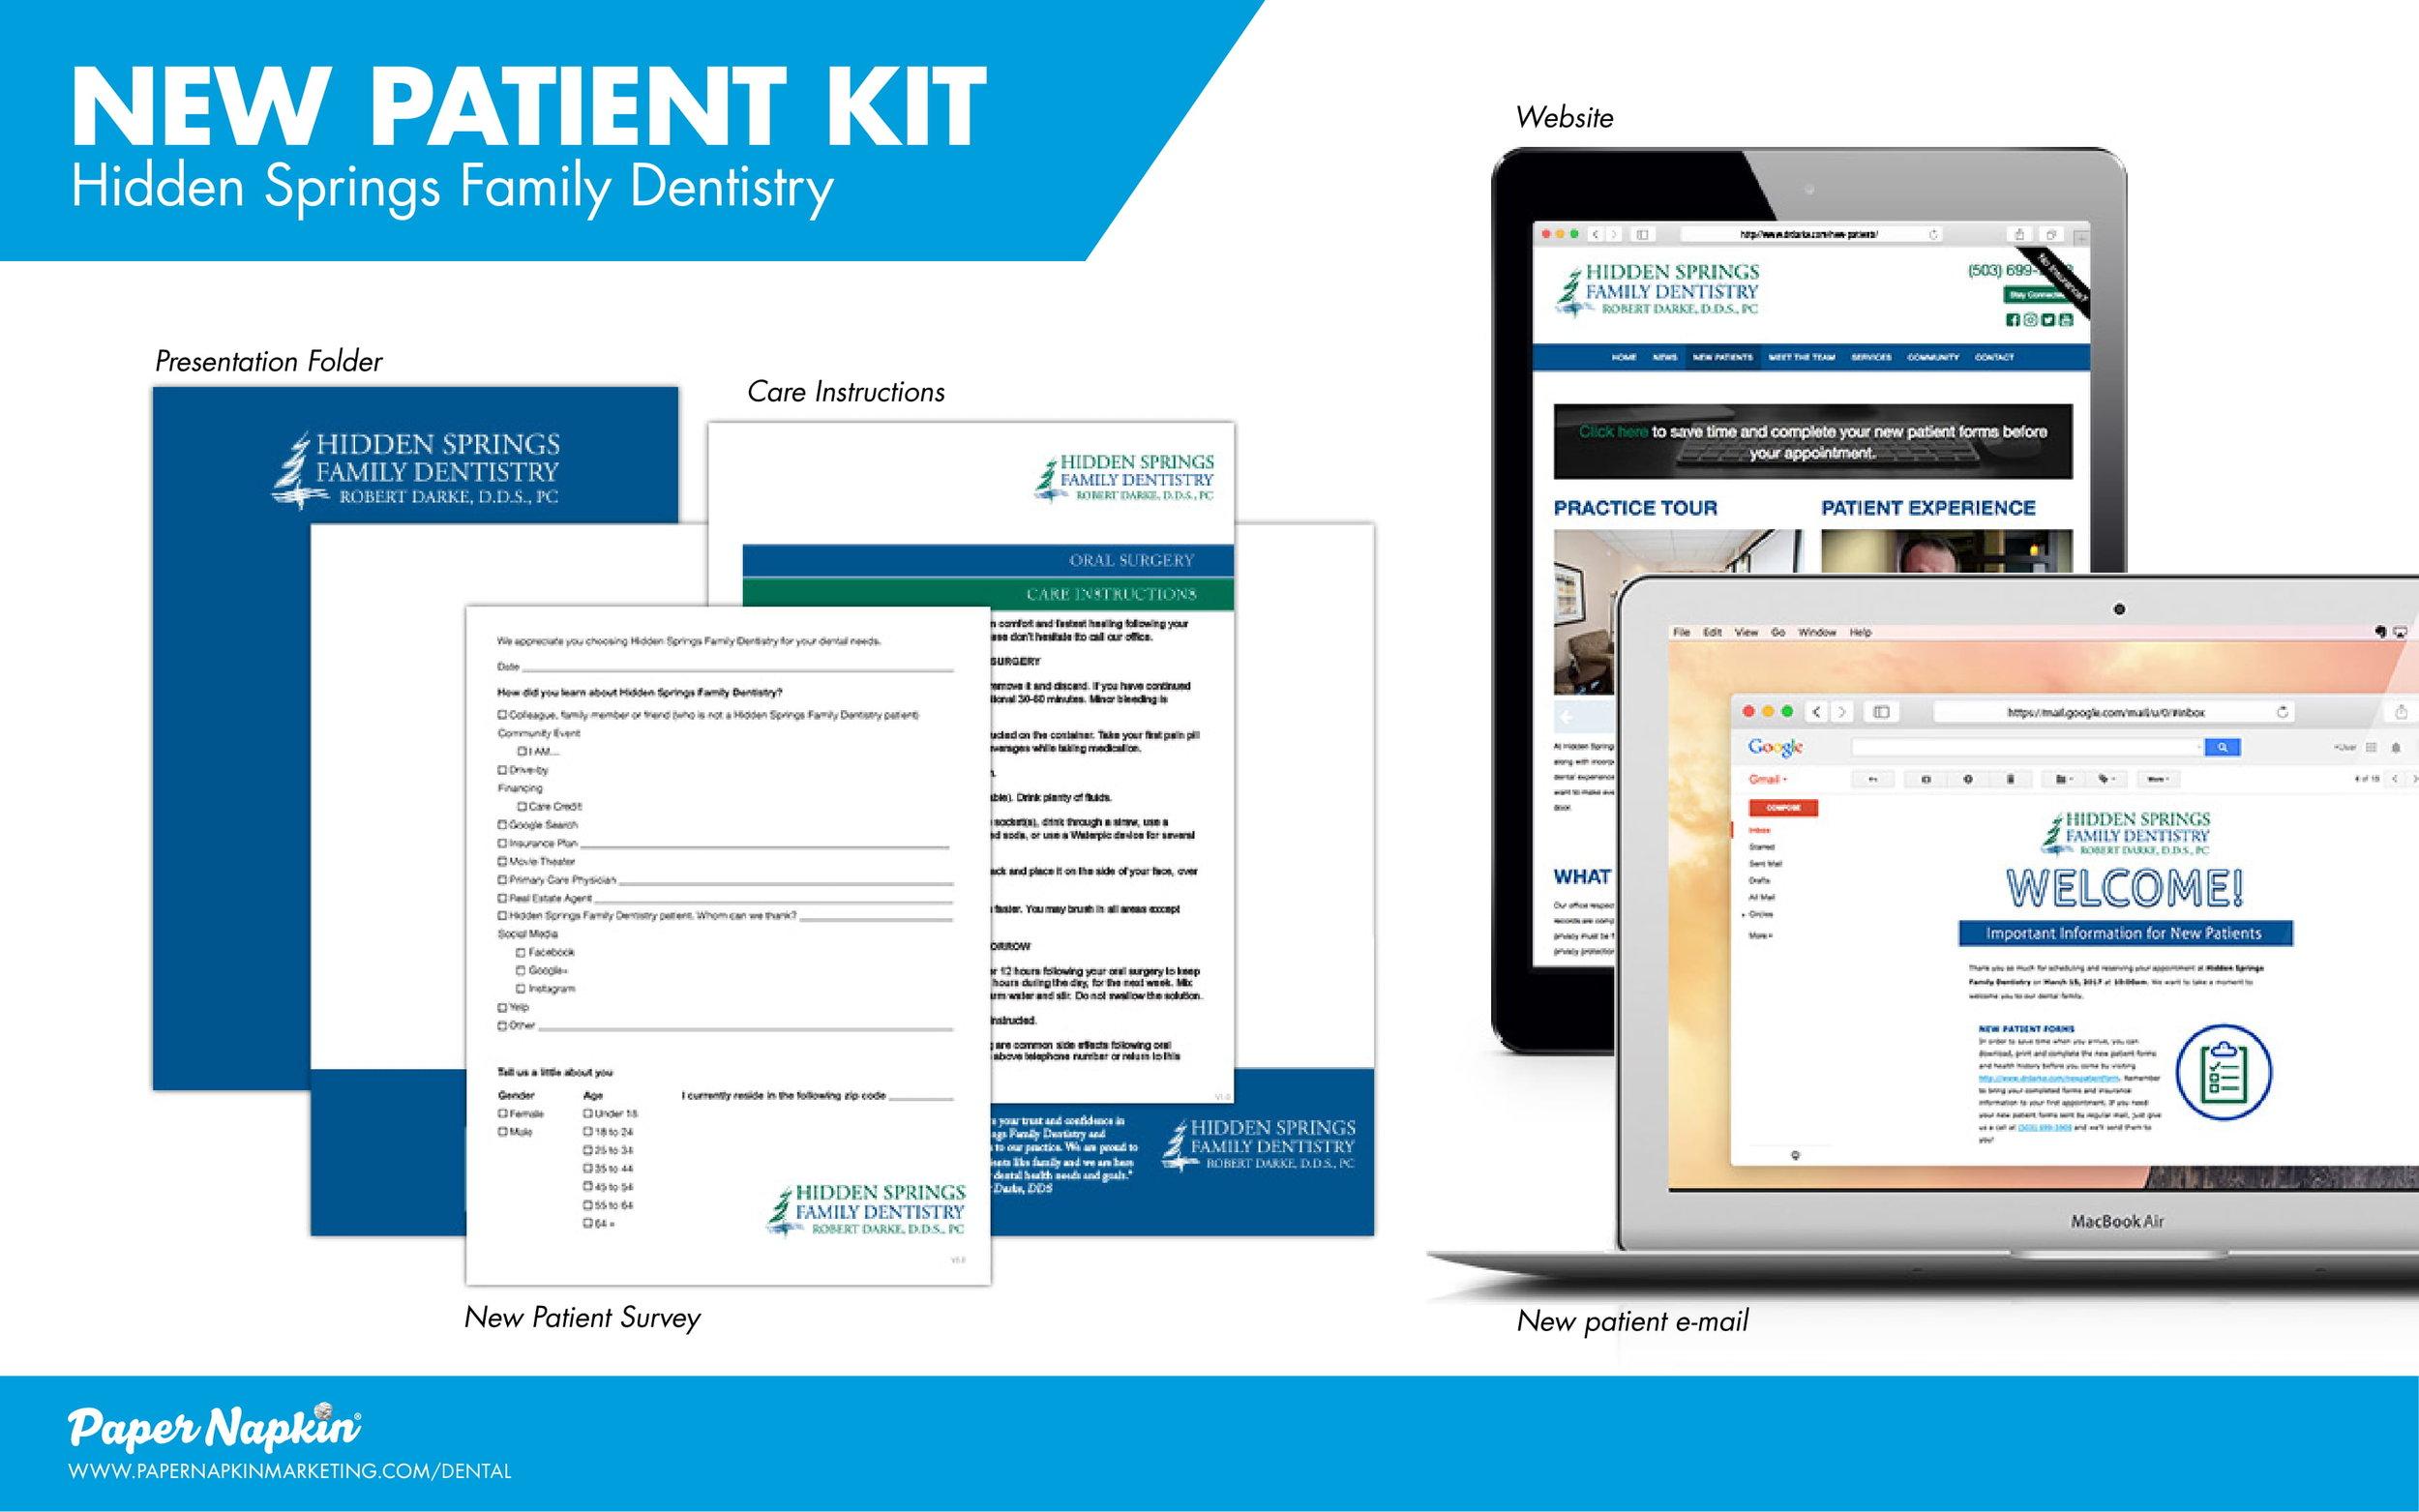 New Patient Kit - HSFD - 03 06 2017-1.jpg